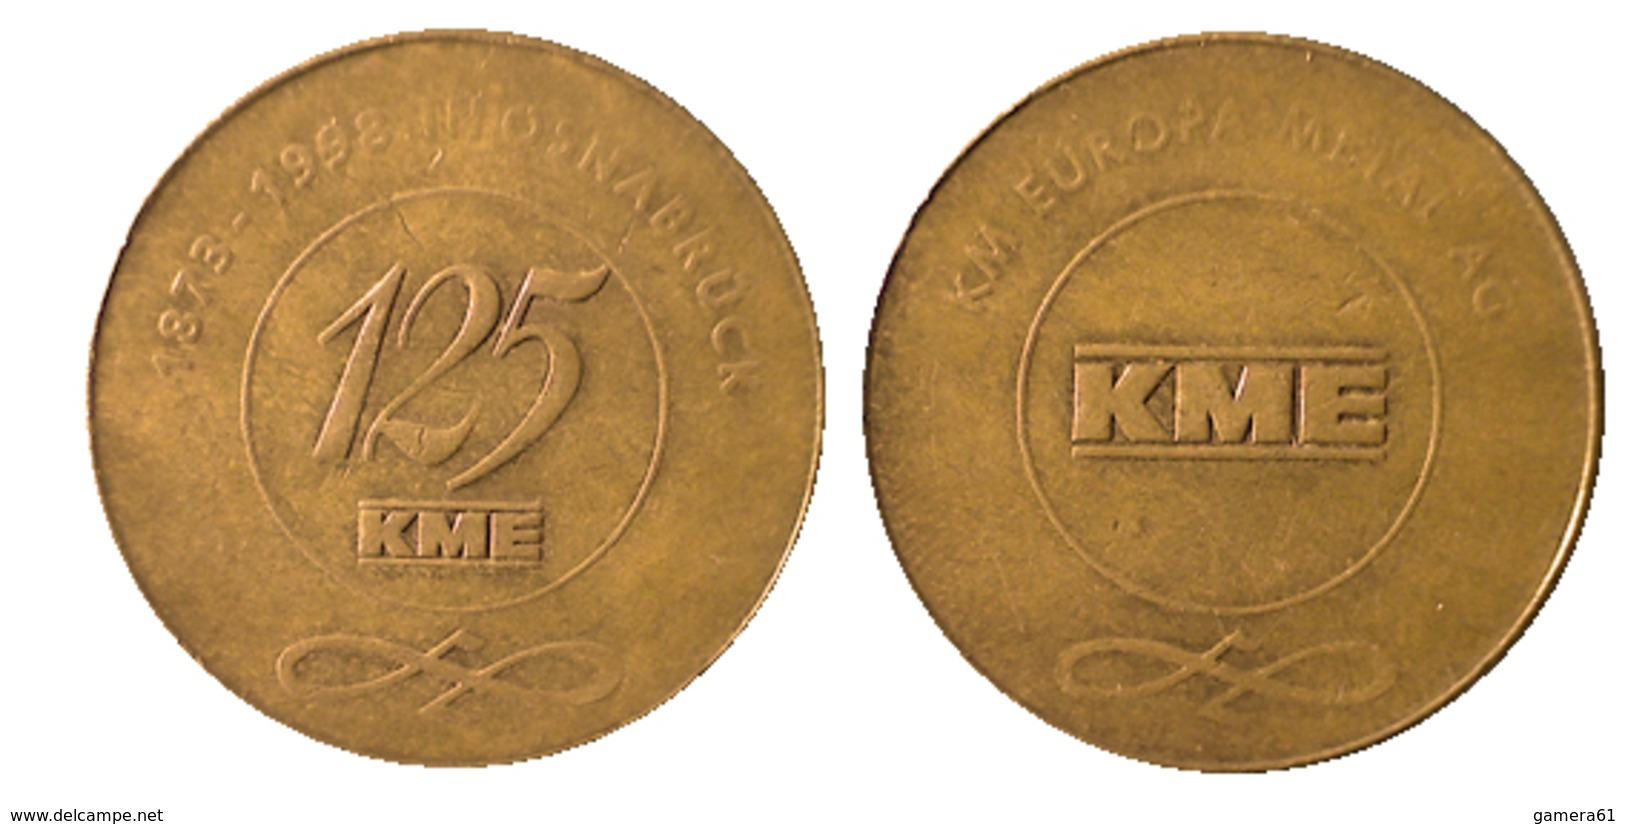 03078 GETTONE JETON TOKEN ANNIVERSARY METAL PRODUCT KME OSNABRUCK 1873-1998 - Allemagne